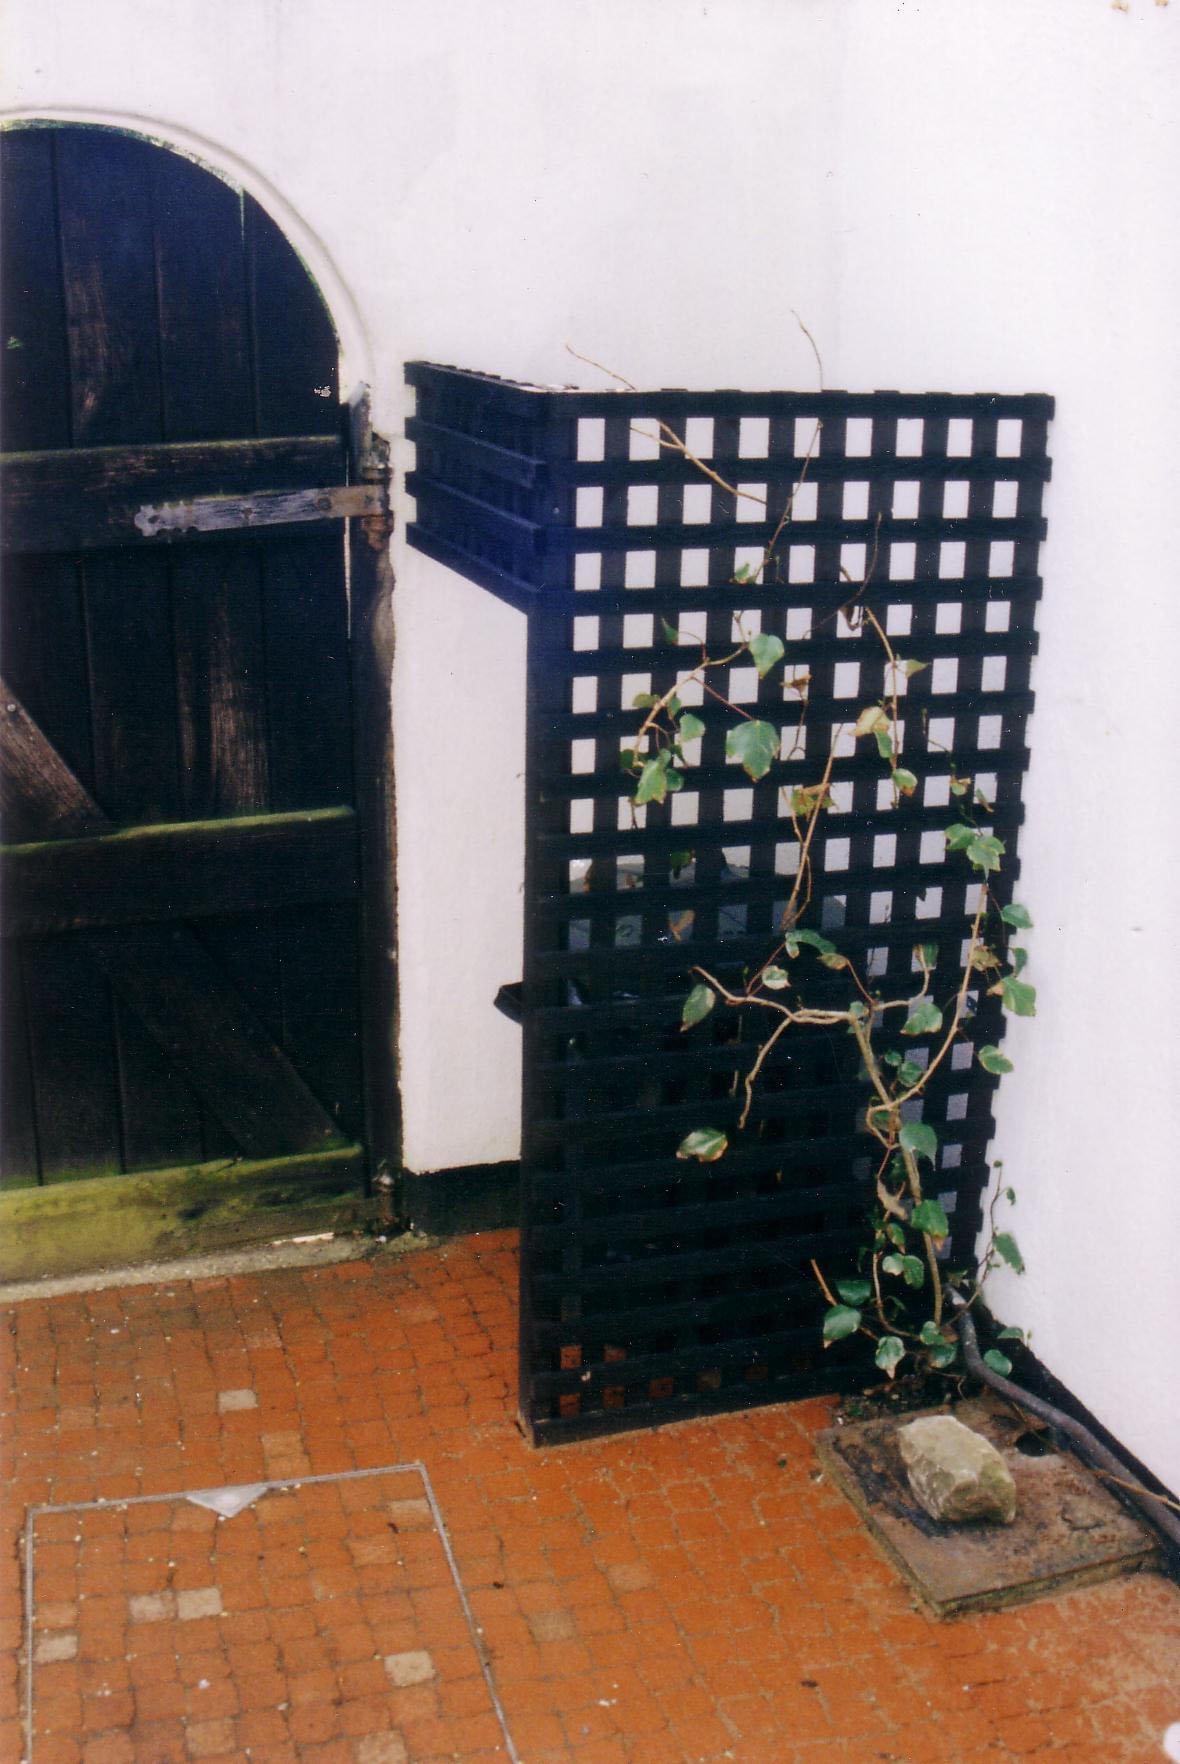 Bin hidden by garden panel